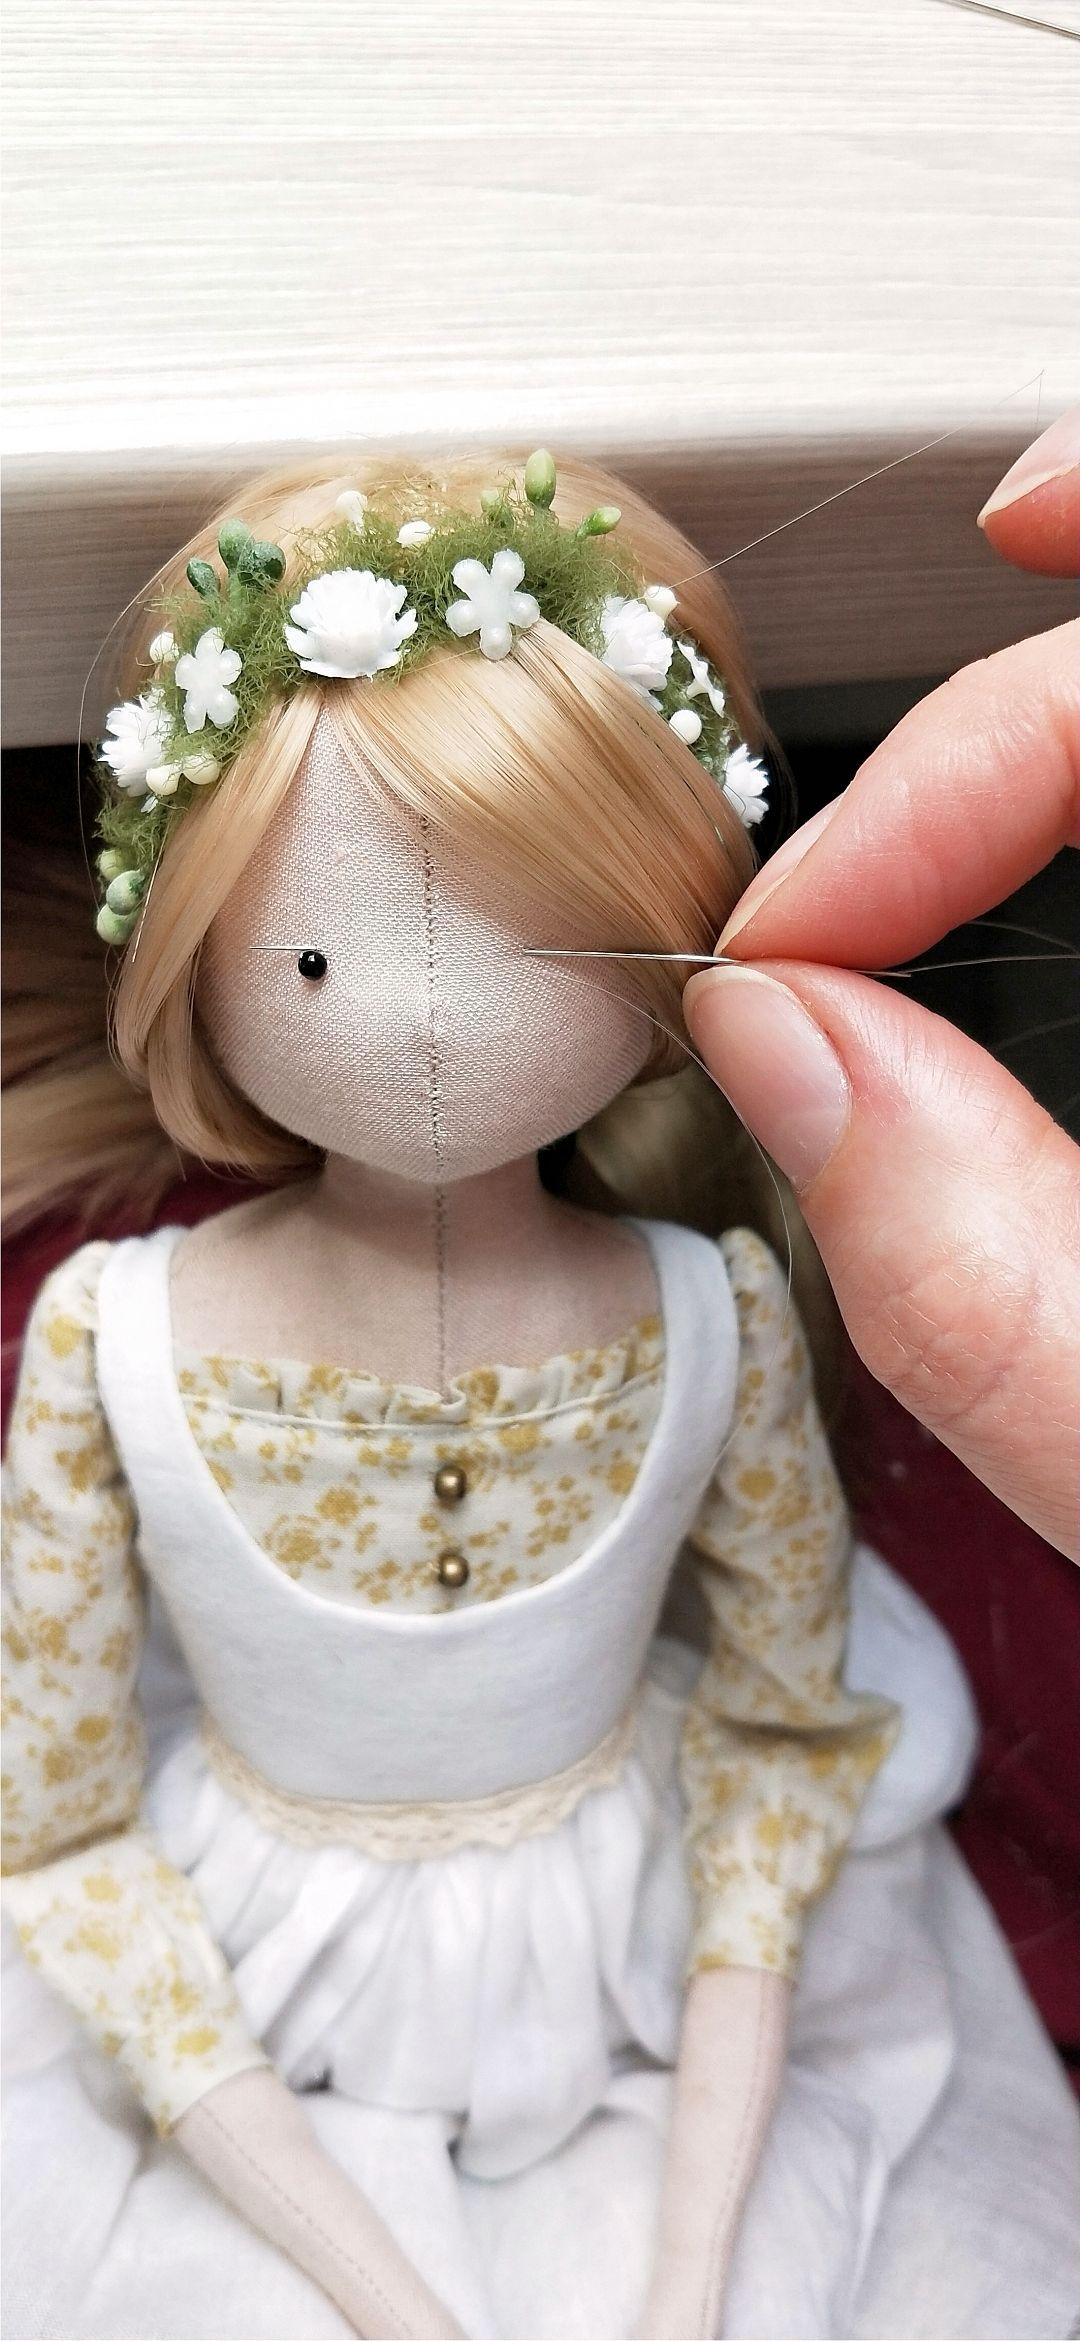 handmade sewing #handmade ...work in progress... handmade sewing doll